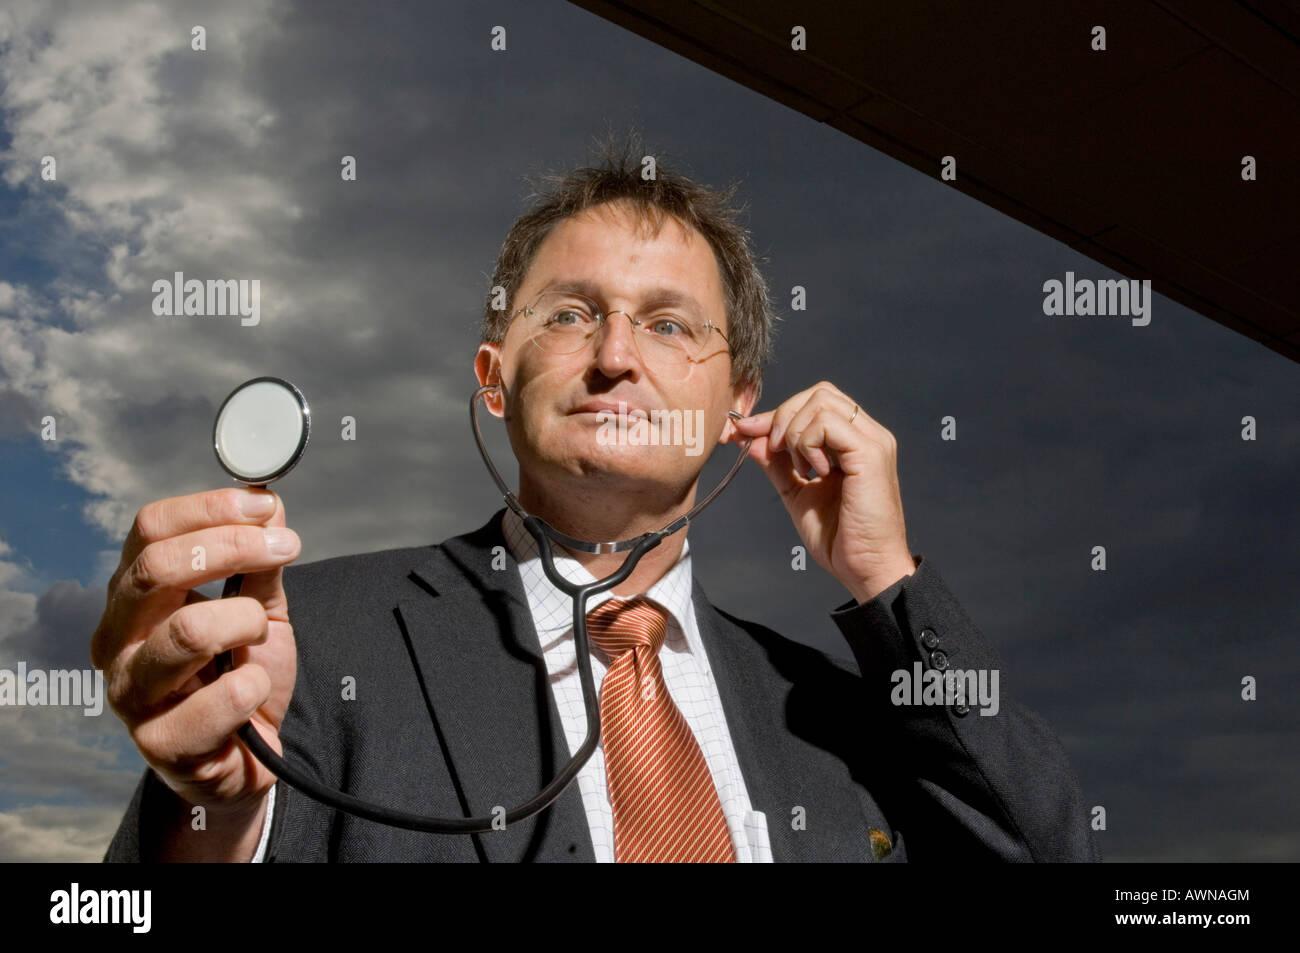 Guenther Jonitz, Presidente de la Cámara de Medicina de Berlín, Alemania Foto de stock